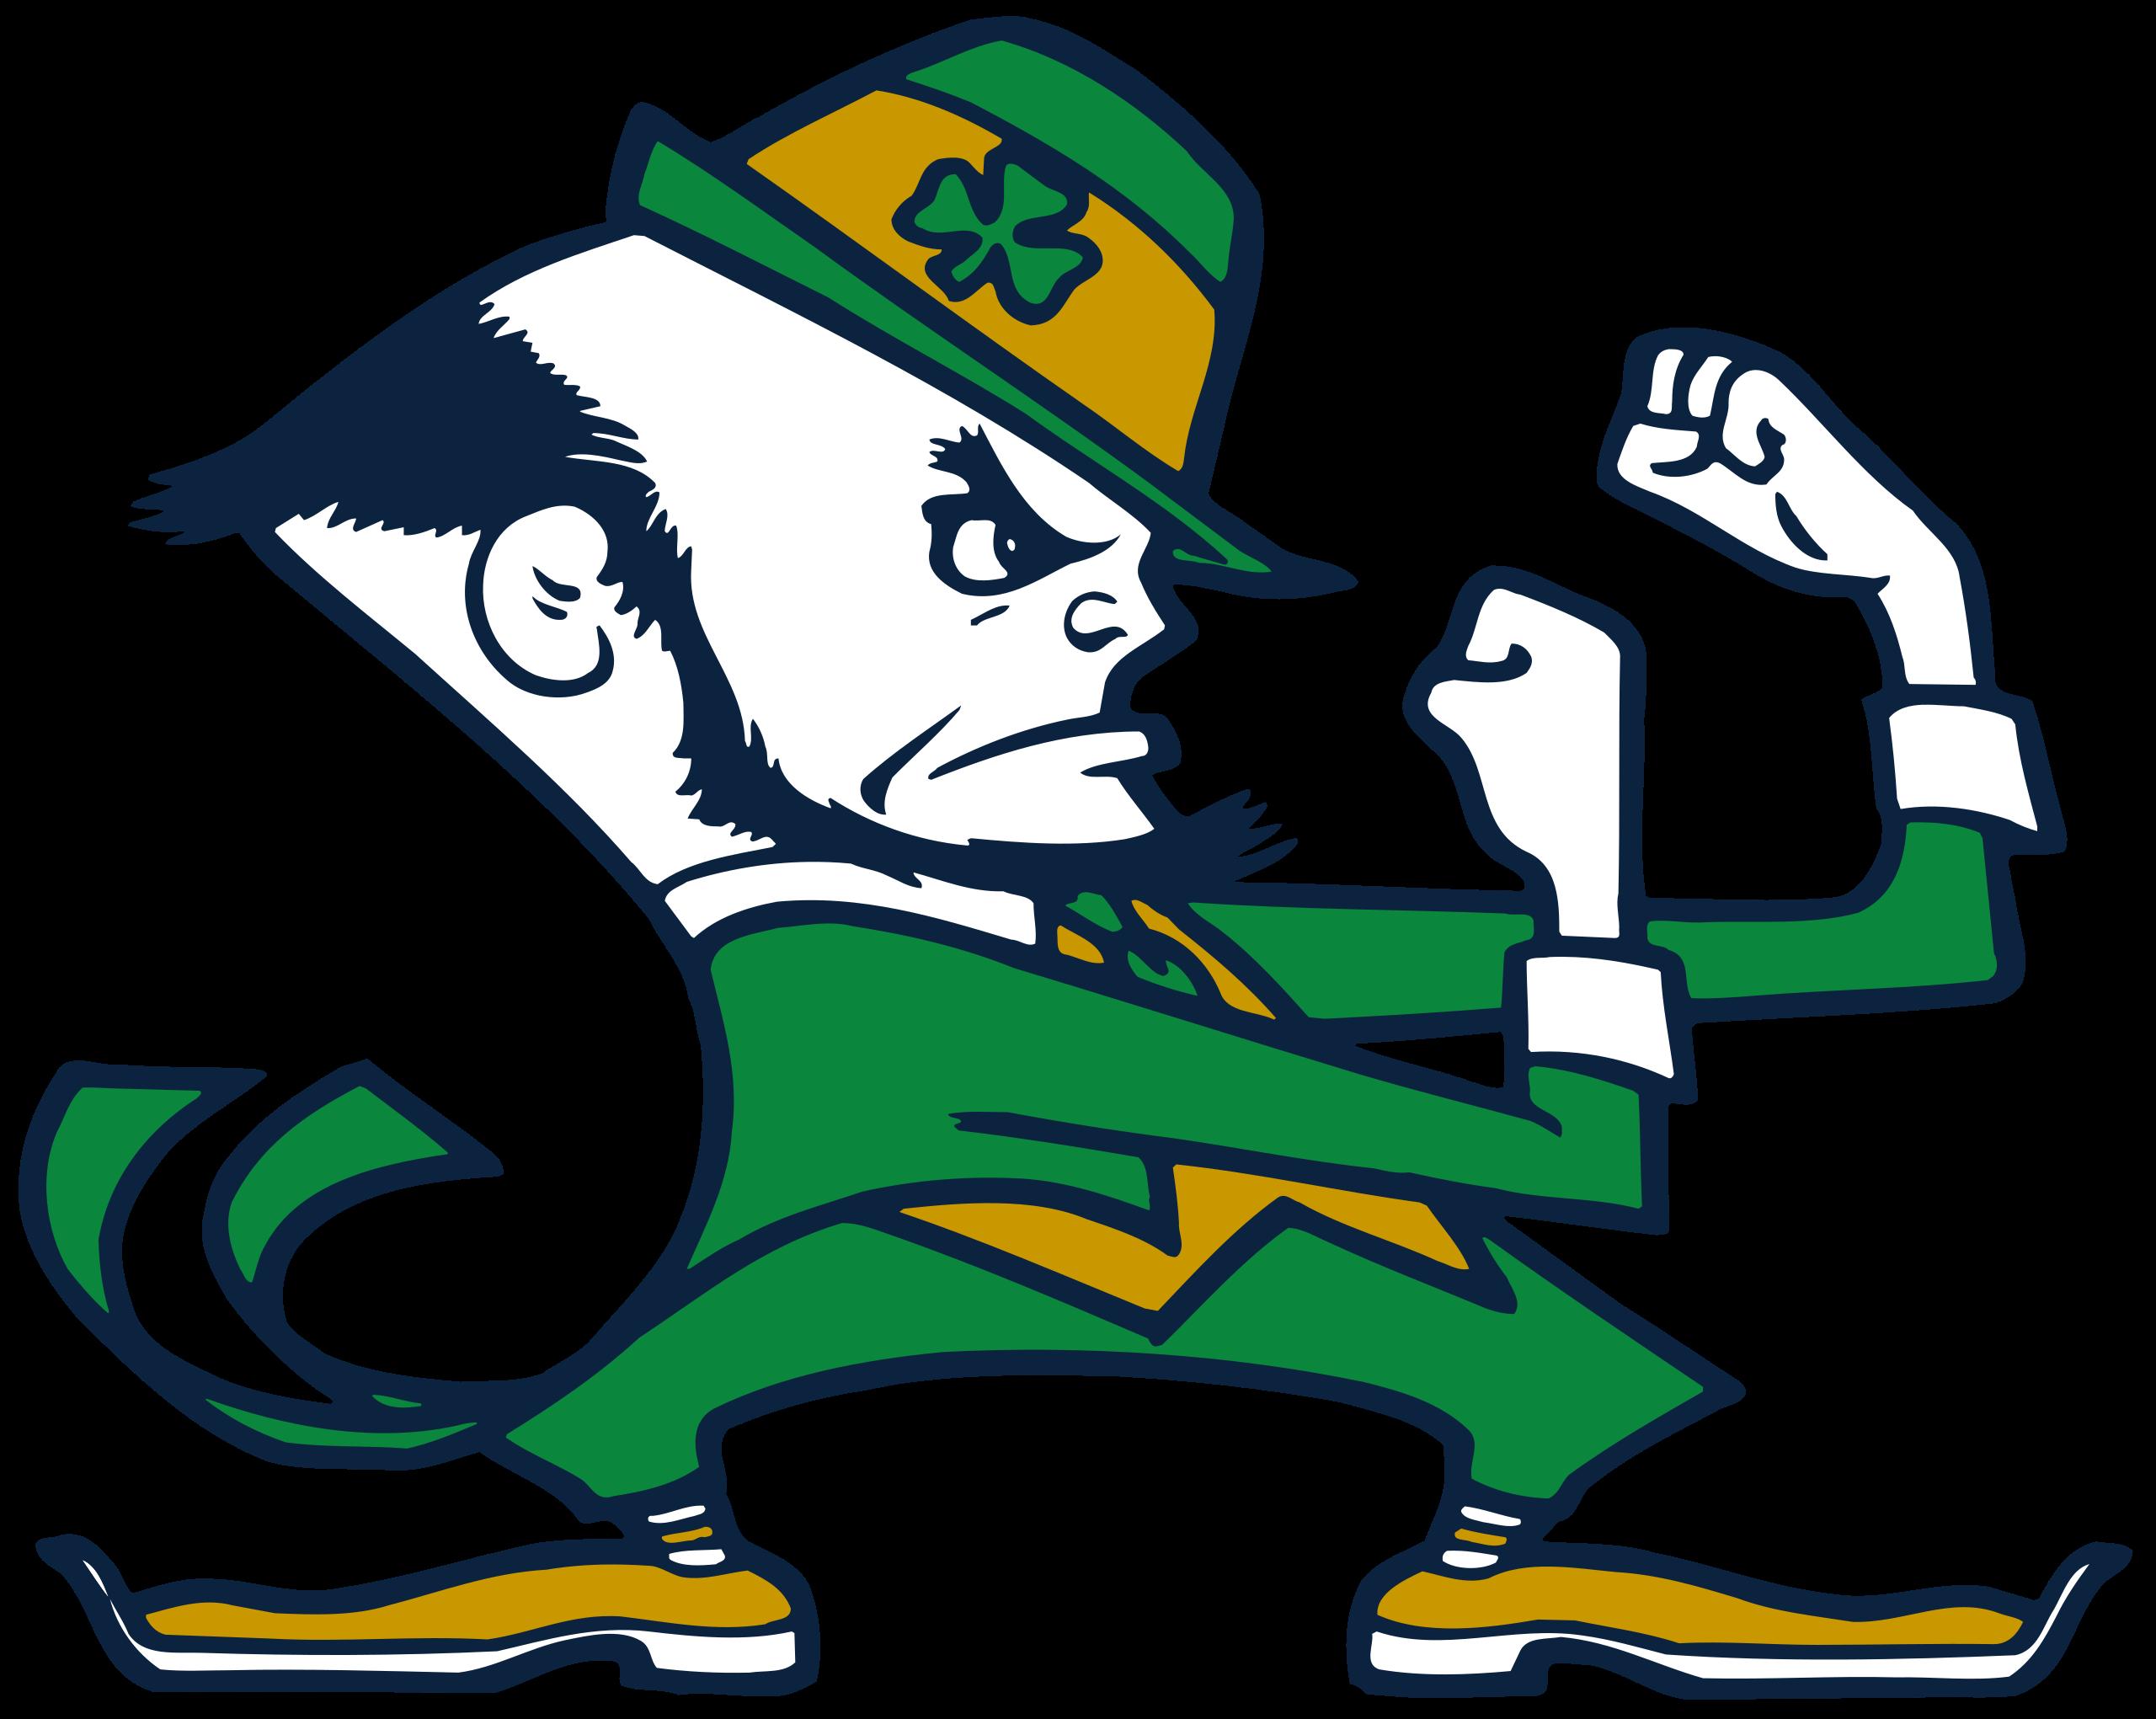 Notre Dame Leprechaun Logo Notre Dame Leprechaun Wikipedia In 2021 Fighting Irish Logo Notre Dame Leprechaun Fighting Irish Football